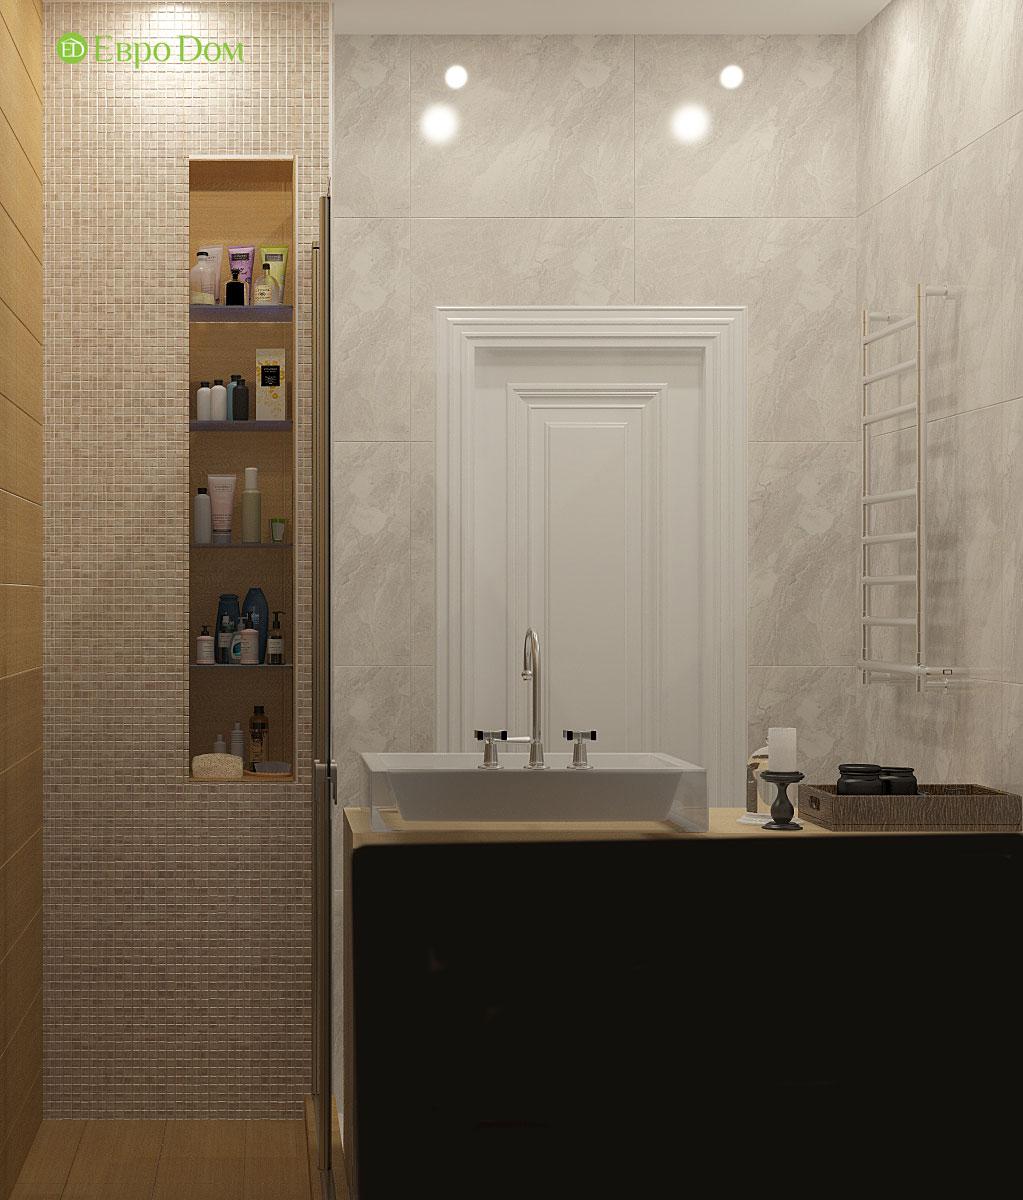 Дизайн 2-комнатной квартиры 60 кв. м в стиле неоклассика. Фото 04